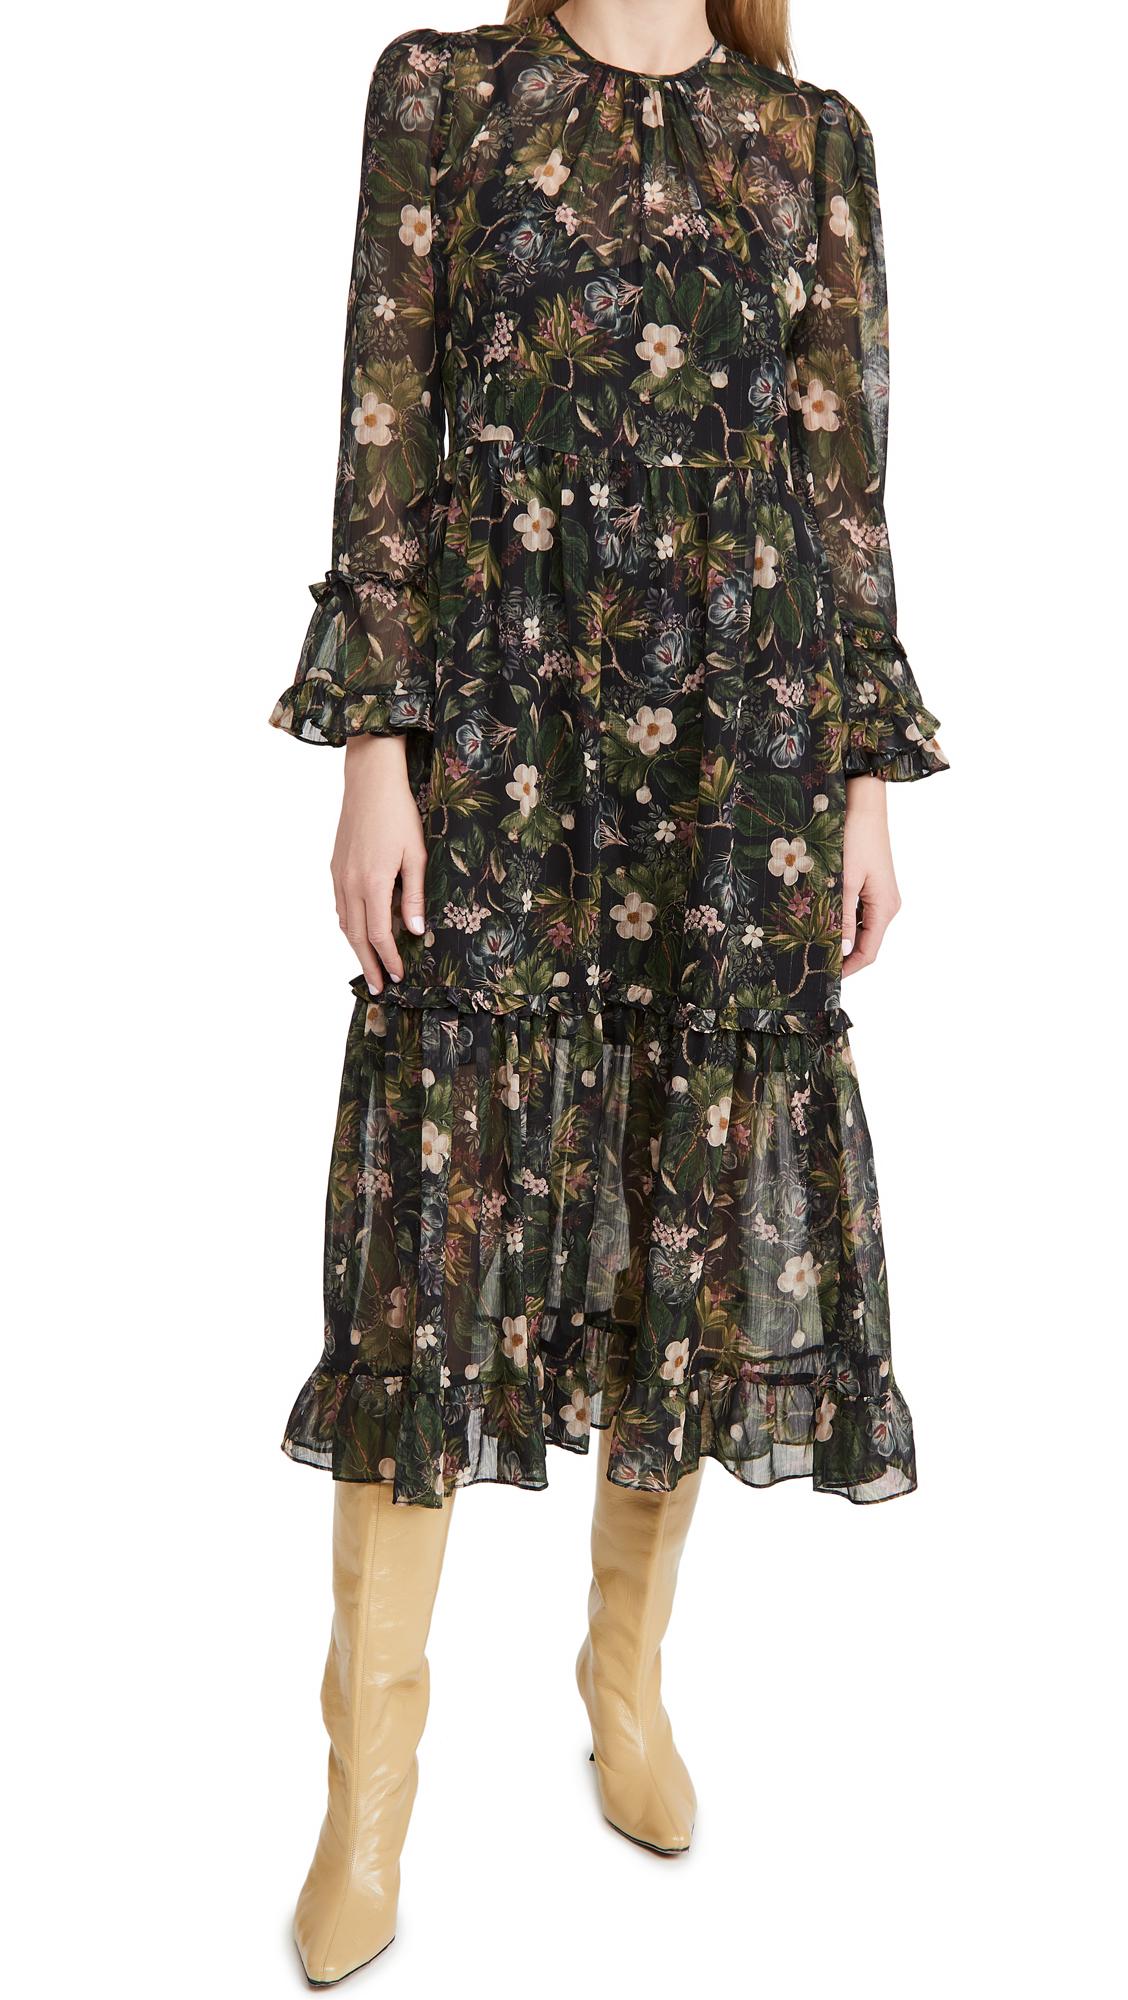 Generation Love Blaine Floral Jungle Maxi Dress